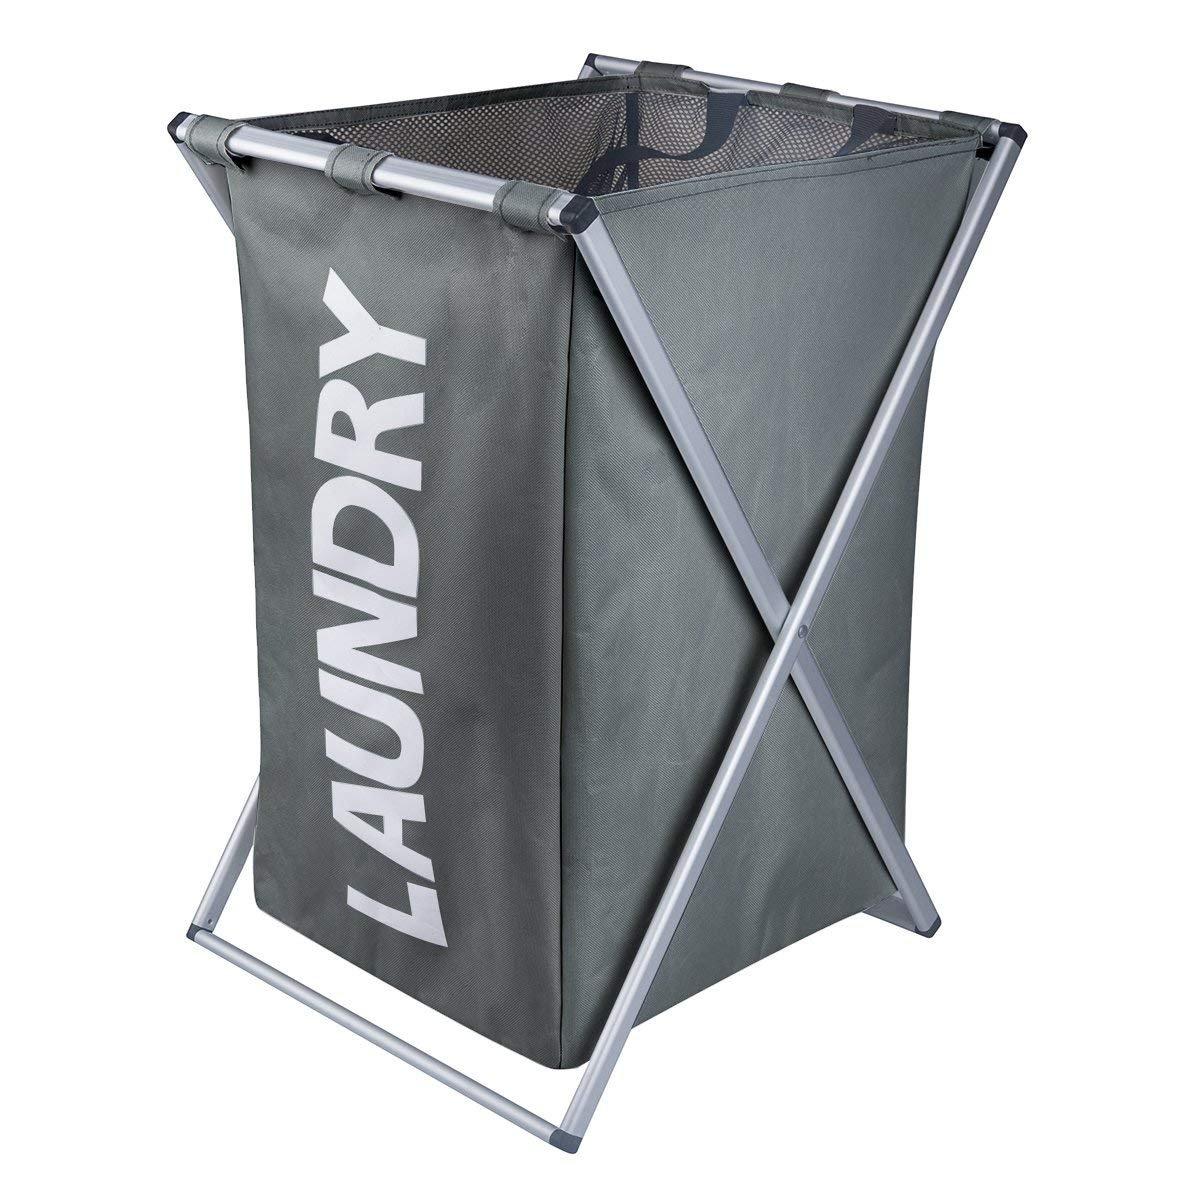 WOWLIVE X-Frame Laundry Hamper Laundry Basket Aluminum Frame Durable Dirty Clothes Bag Bathroom Bedroom Home